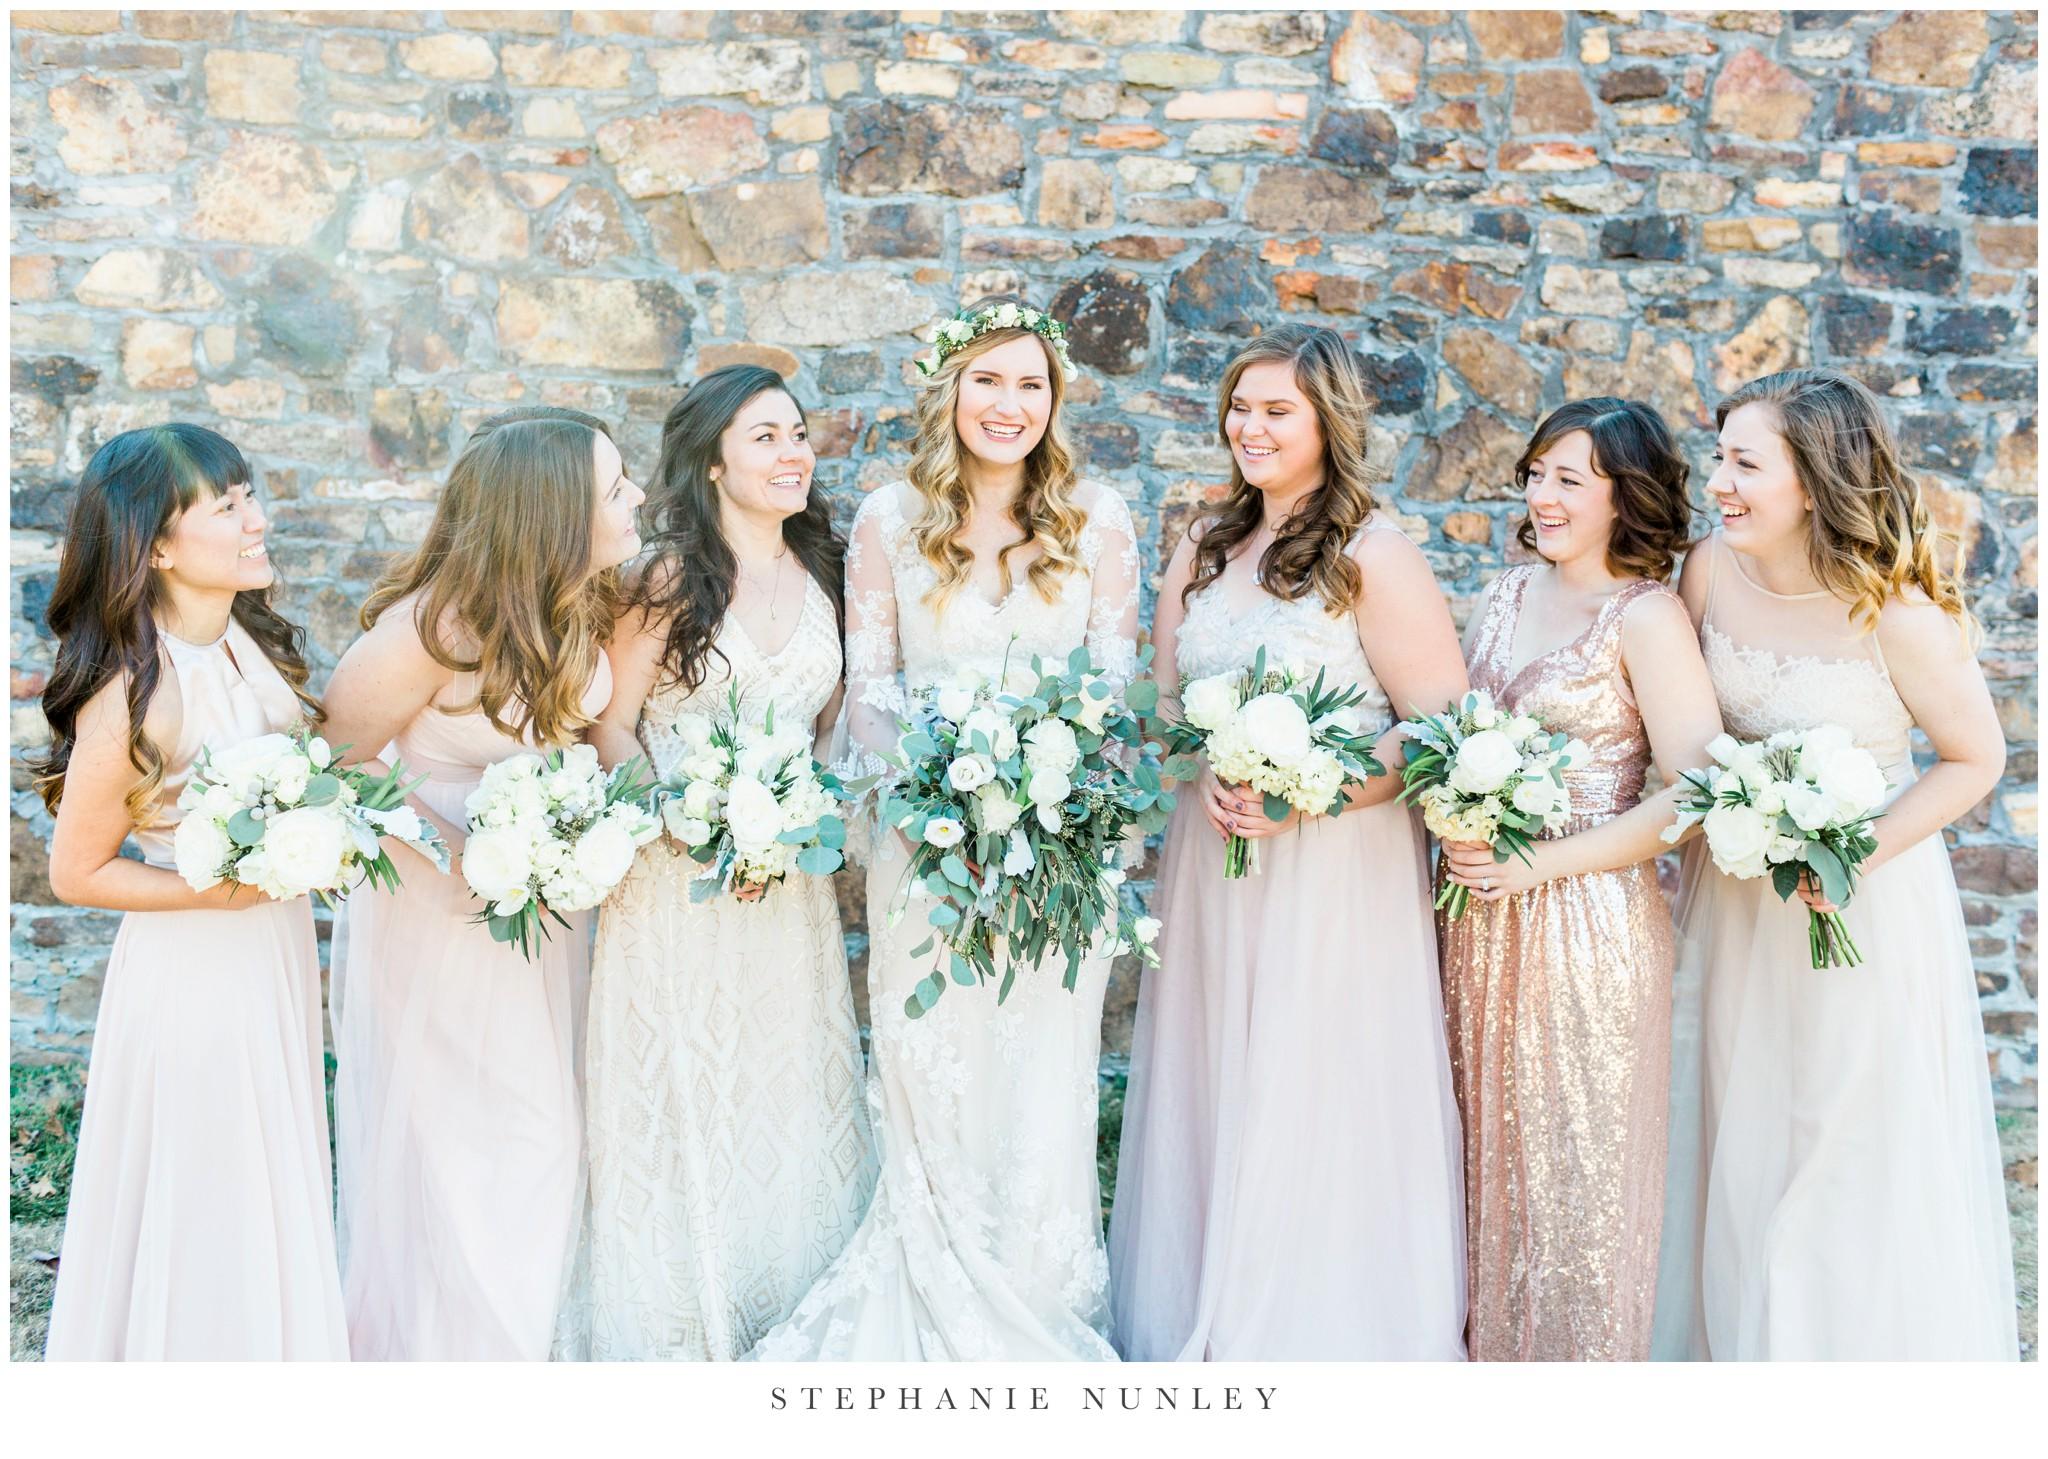 sassafrass-springs-vineyard-film-wedding-photos-47.jpg